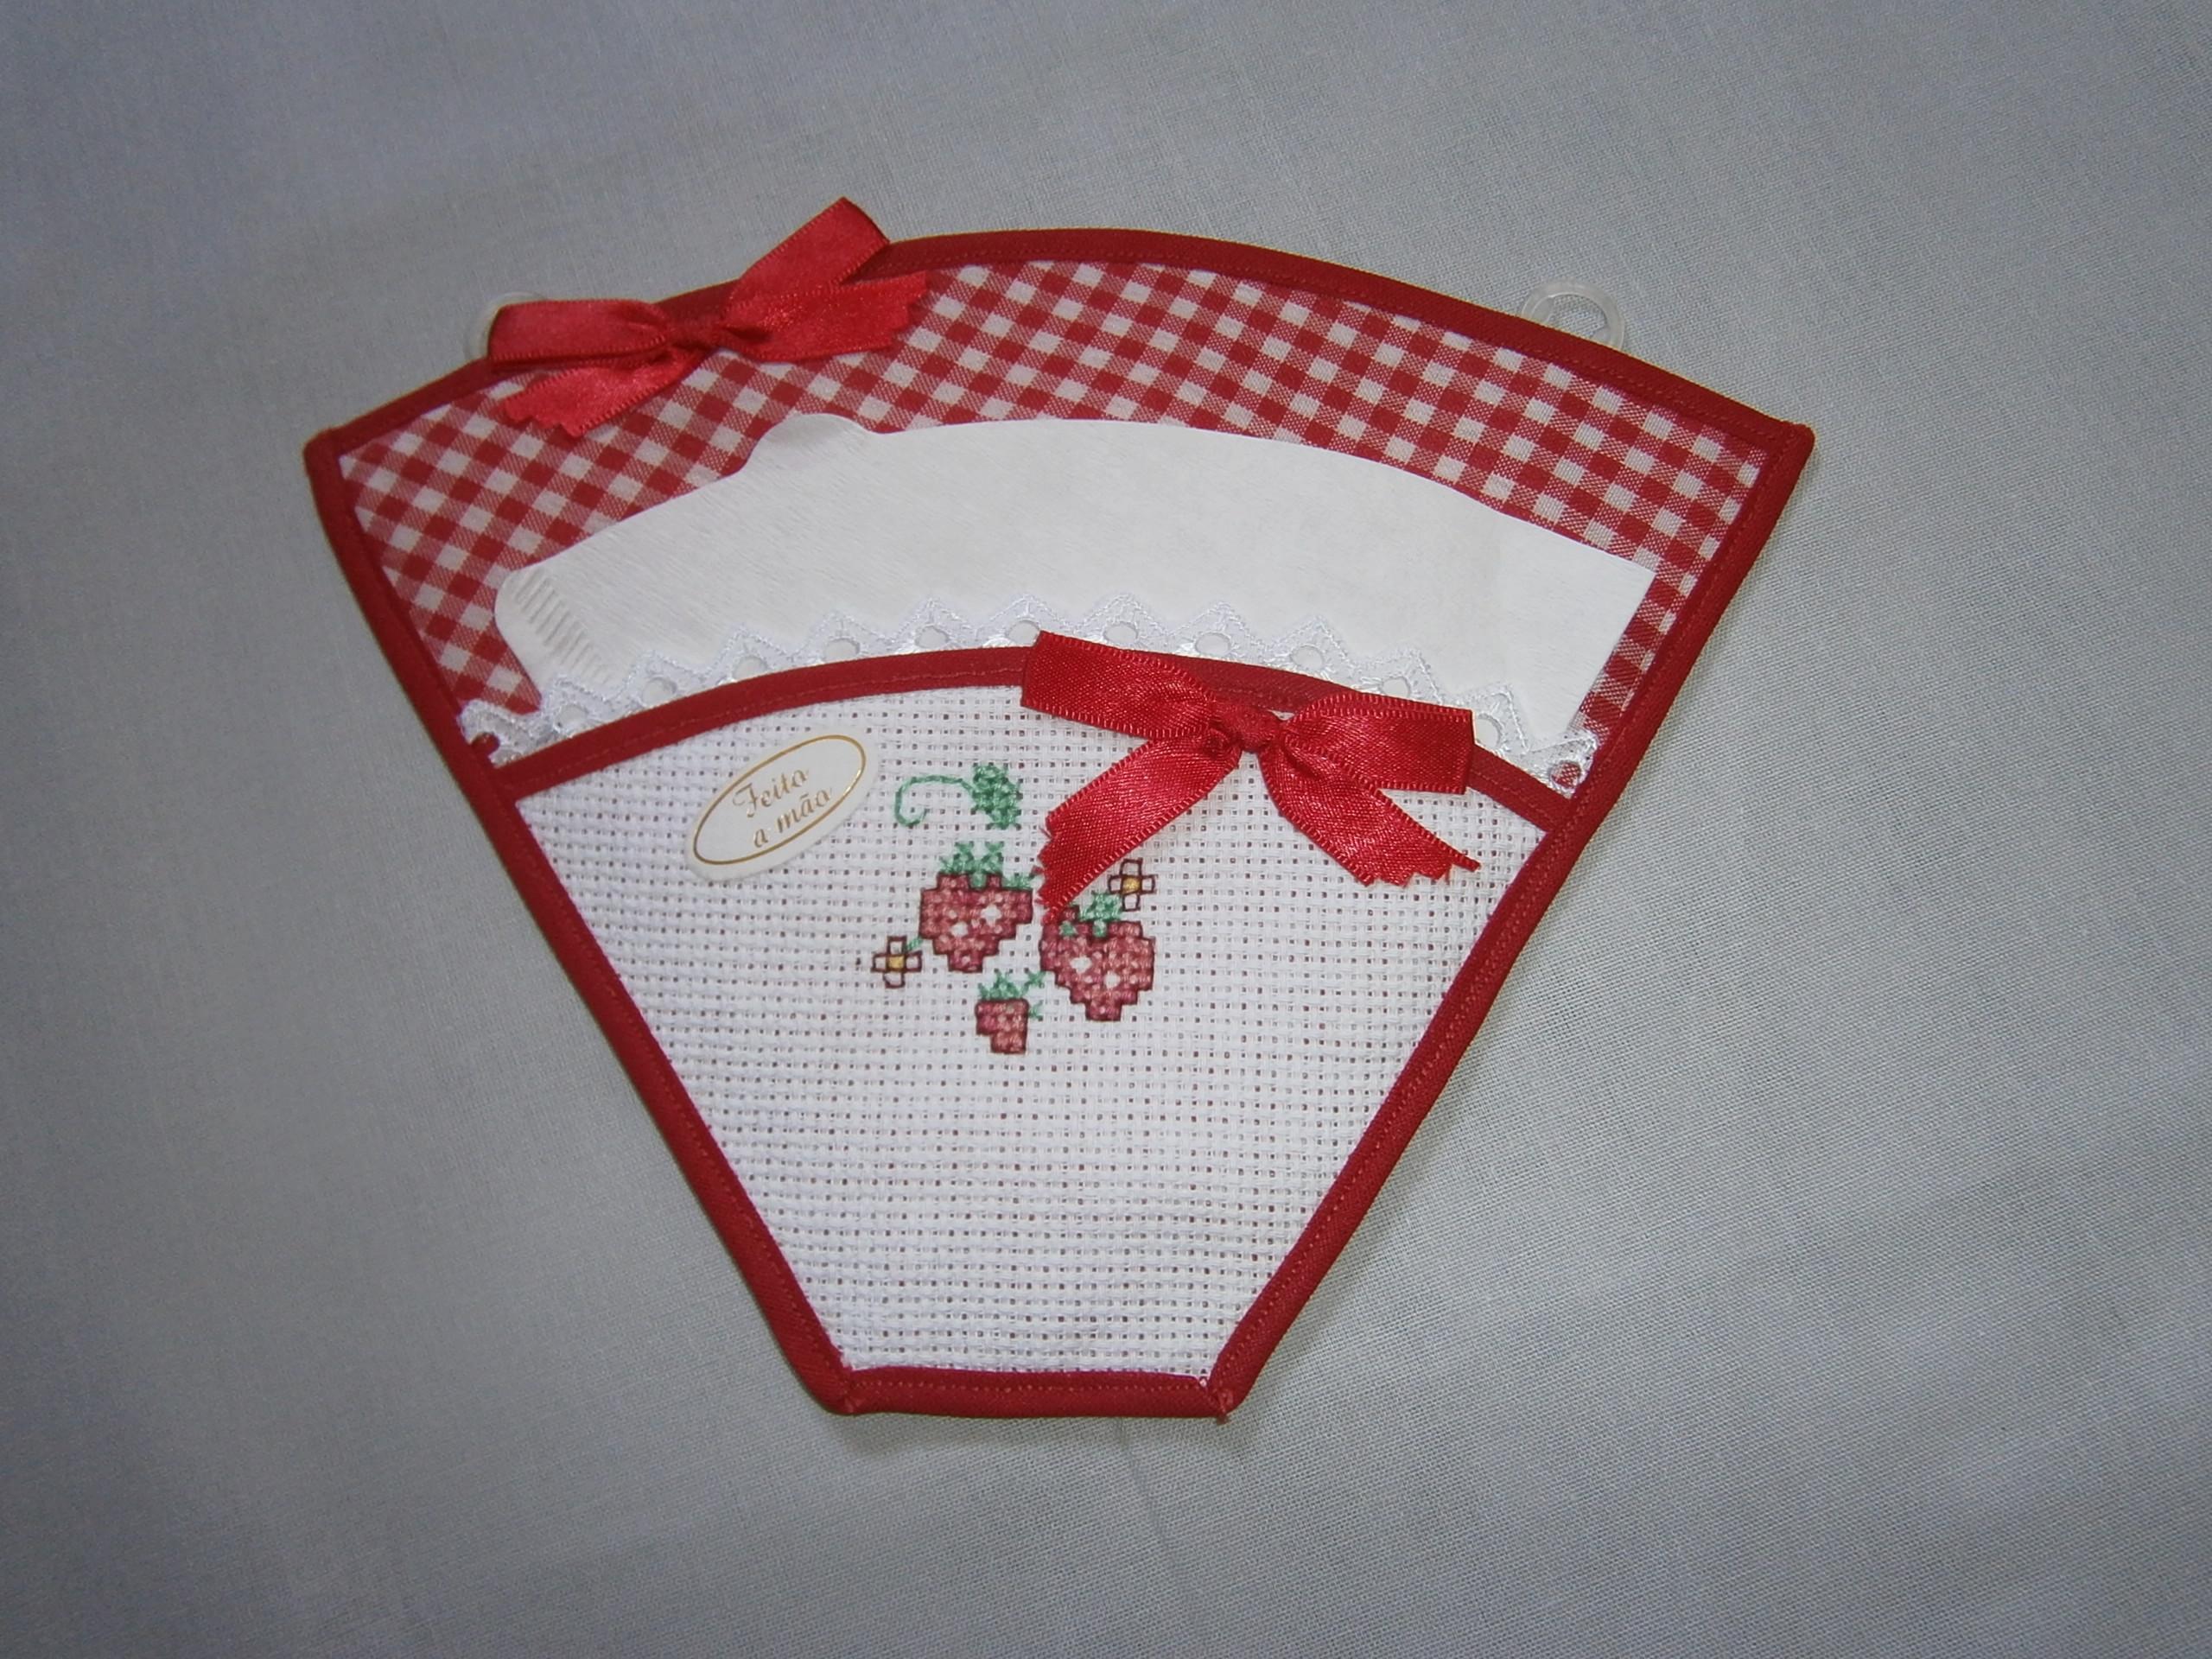 Porta Filtro Xadrez Vermelho